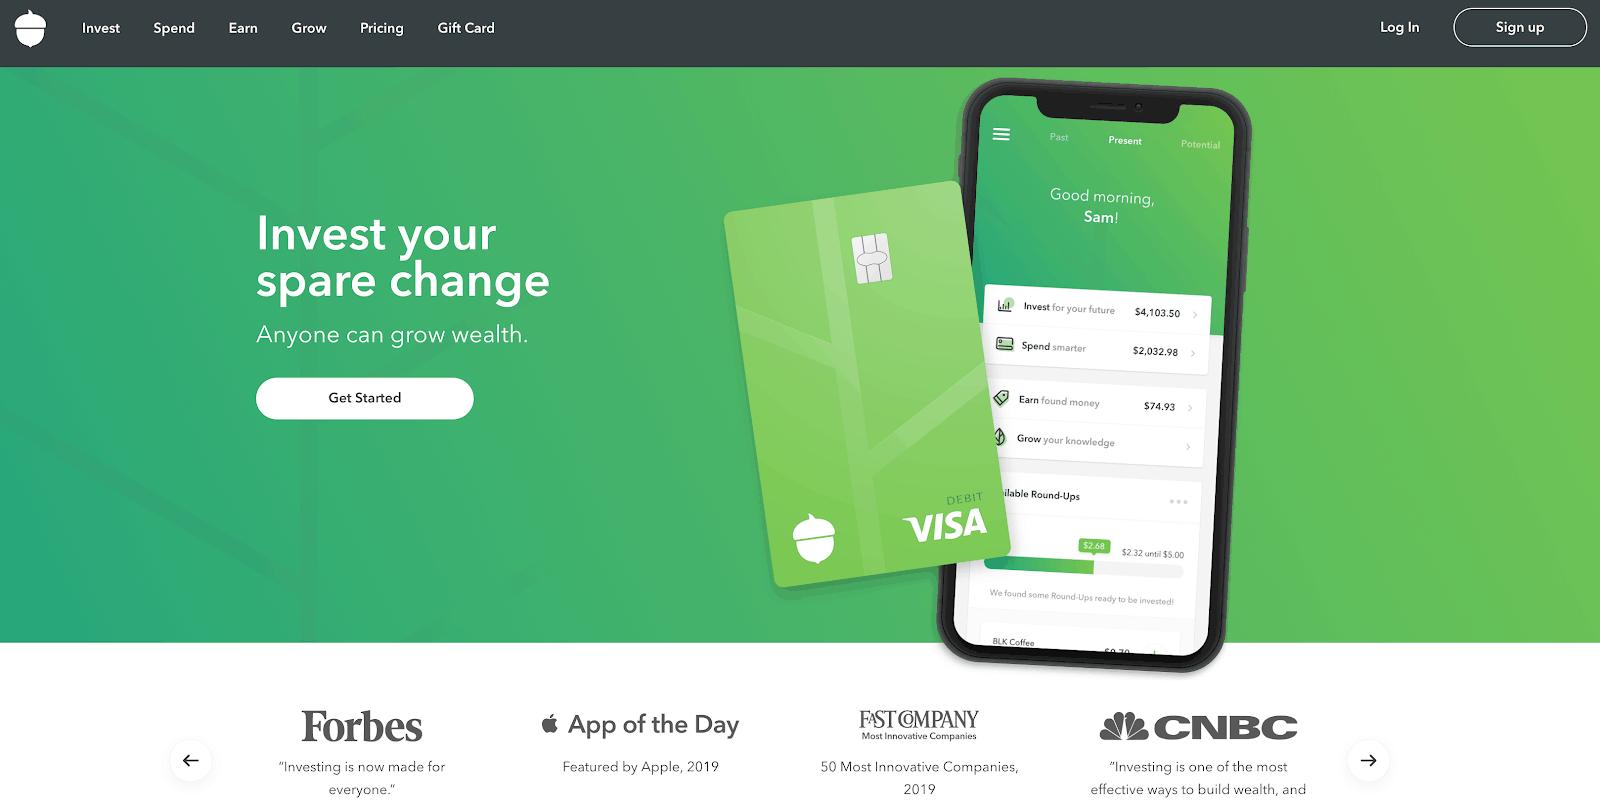 Screenshot 2019 05 17 11.09.15